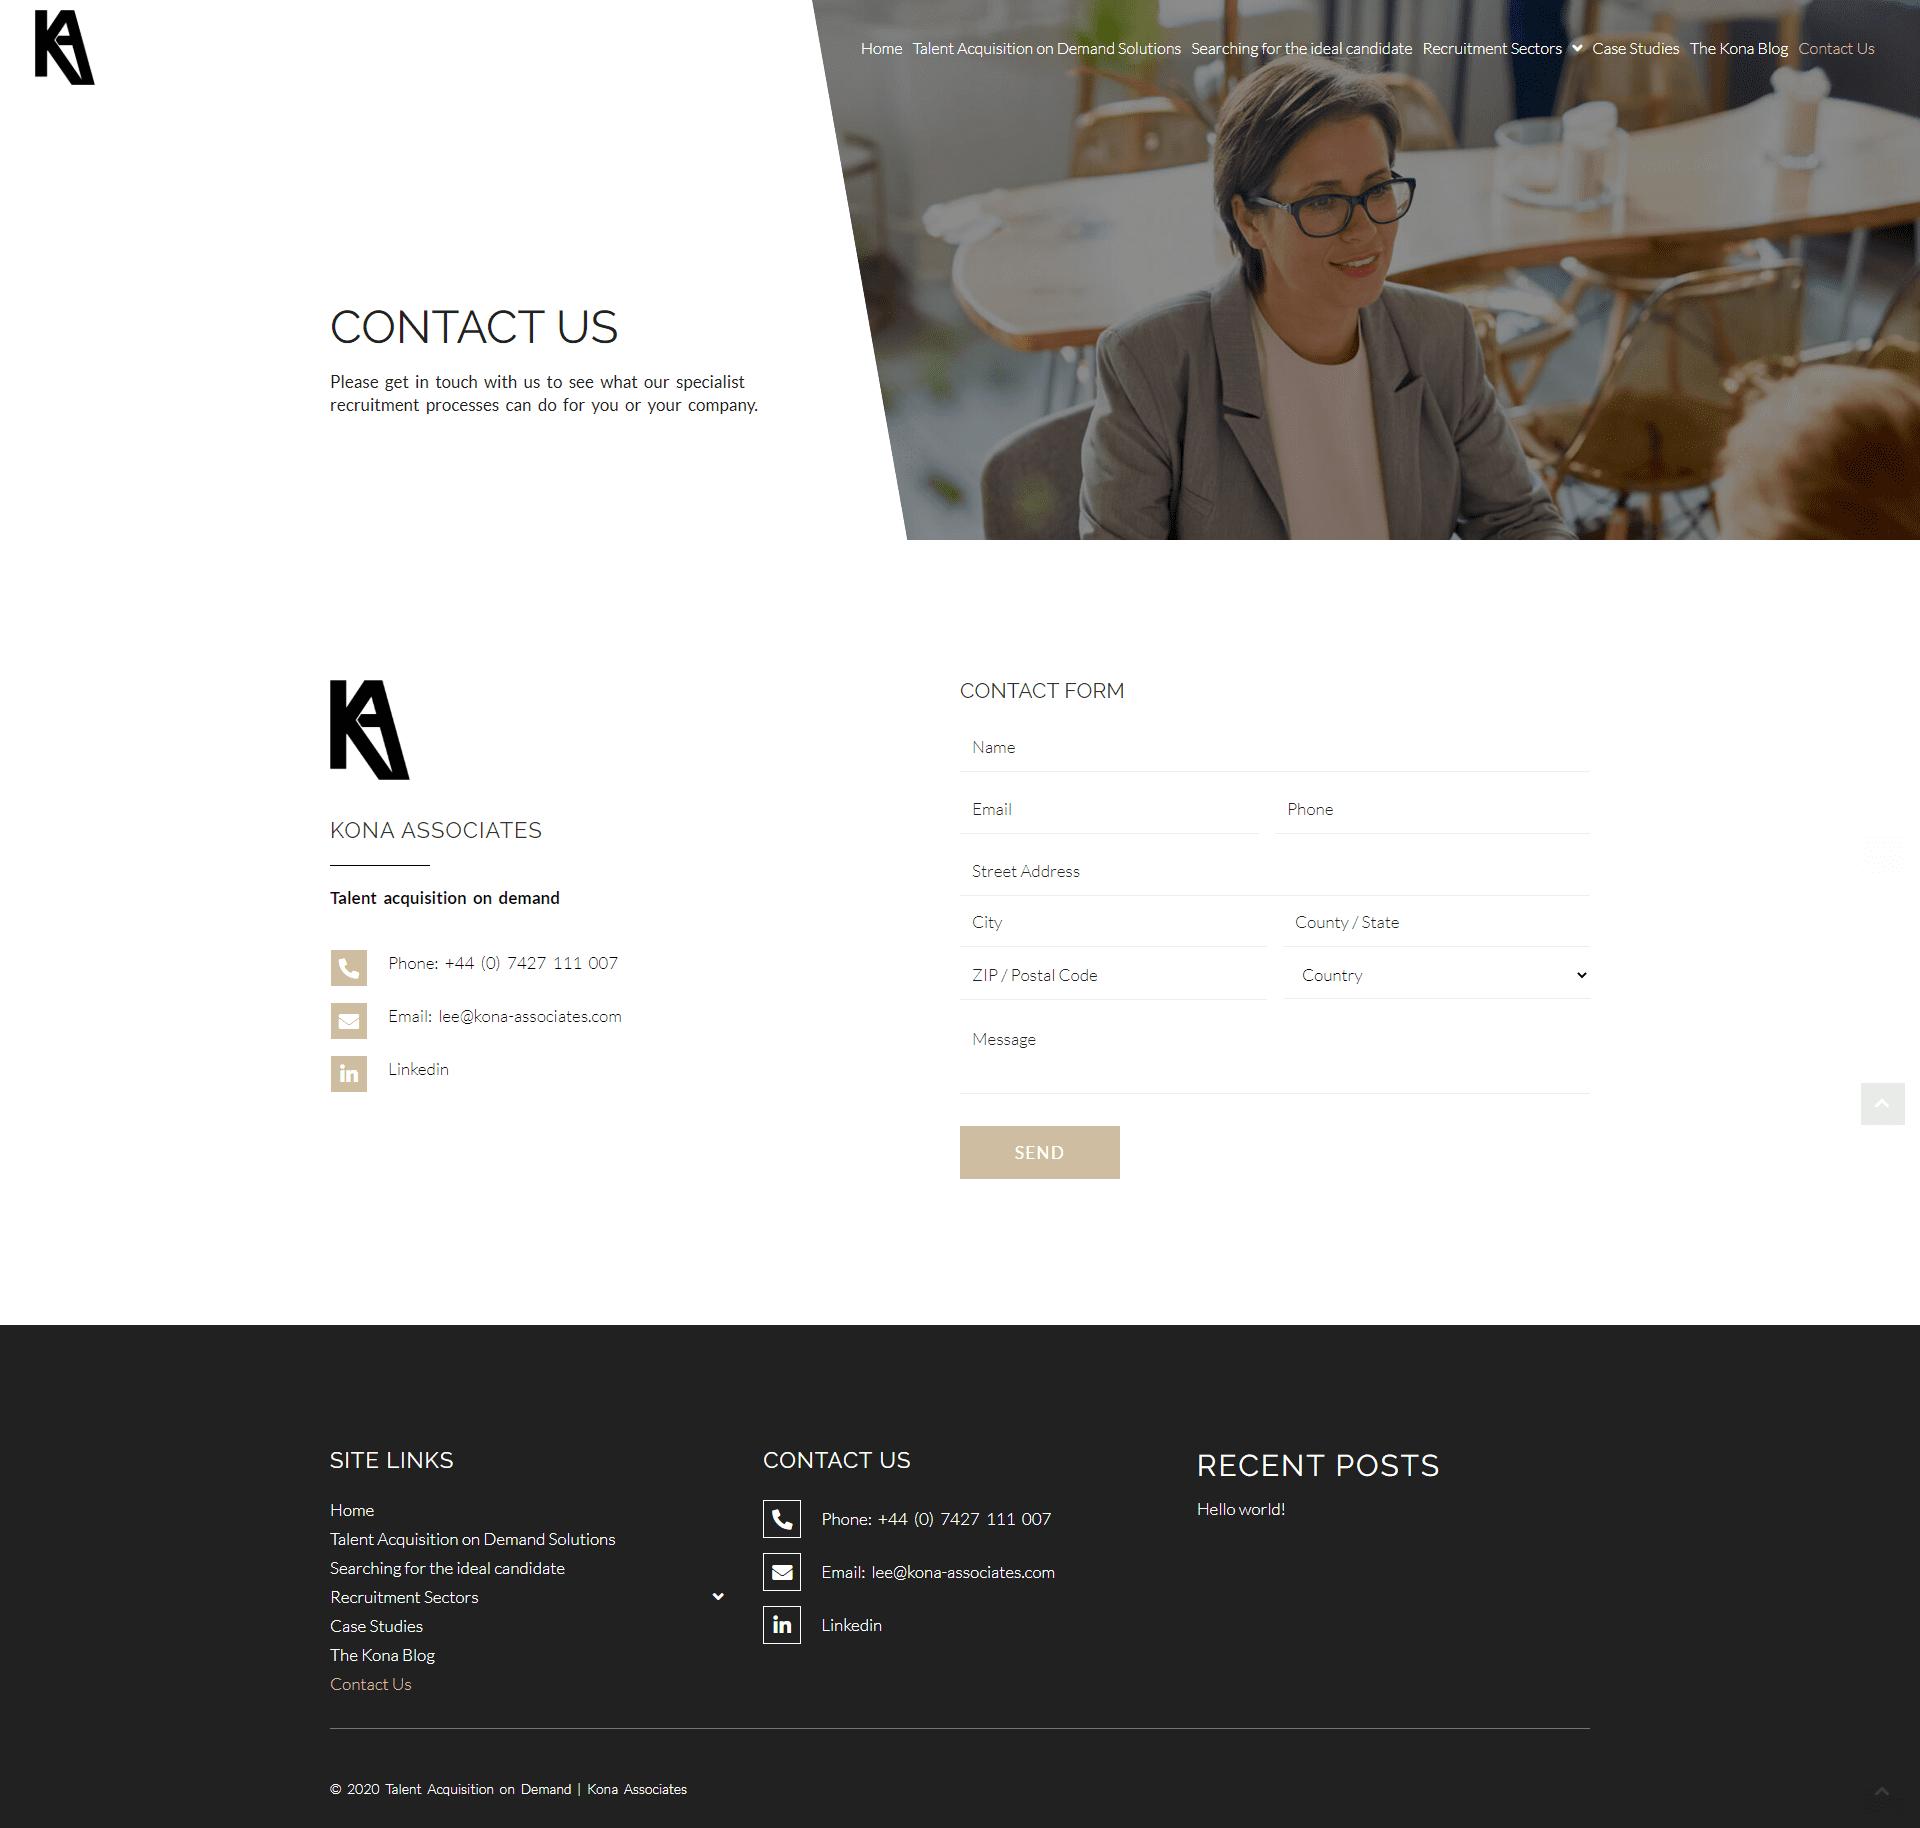 Kona Associates Contact Page